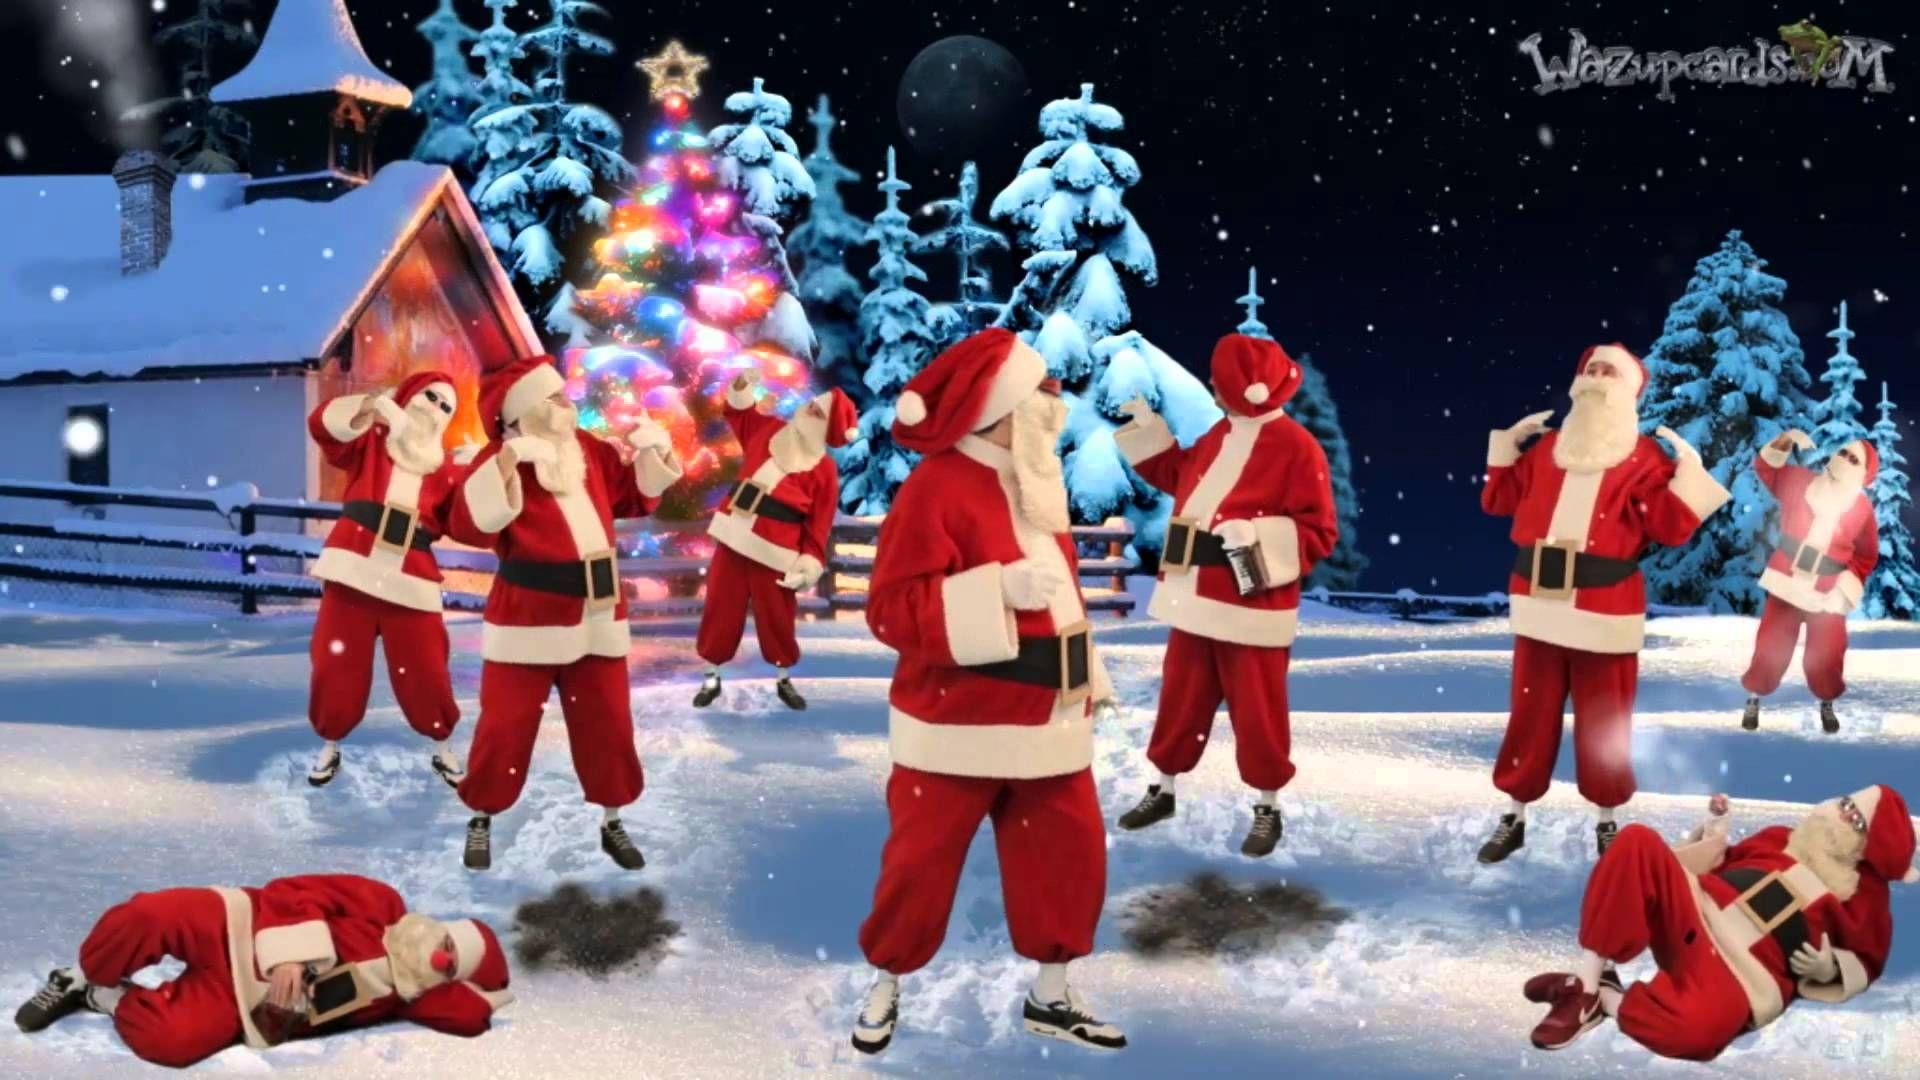 Funny Jingle Bells Christmas Songs Plus Lots More